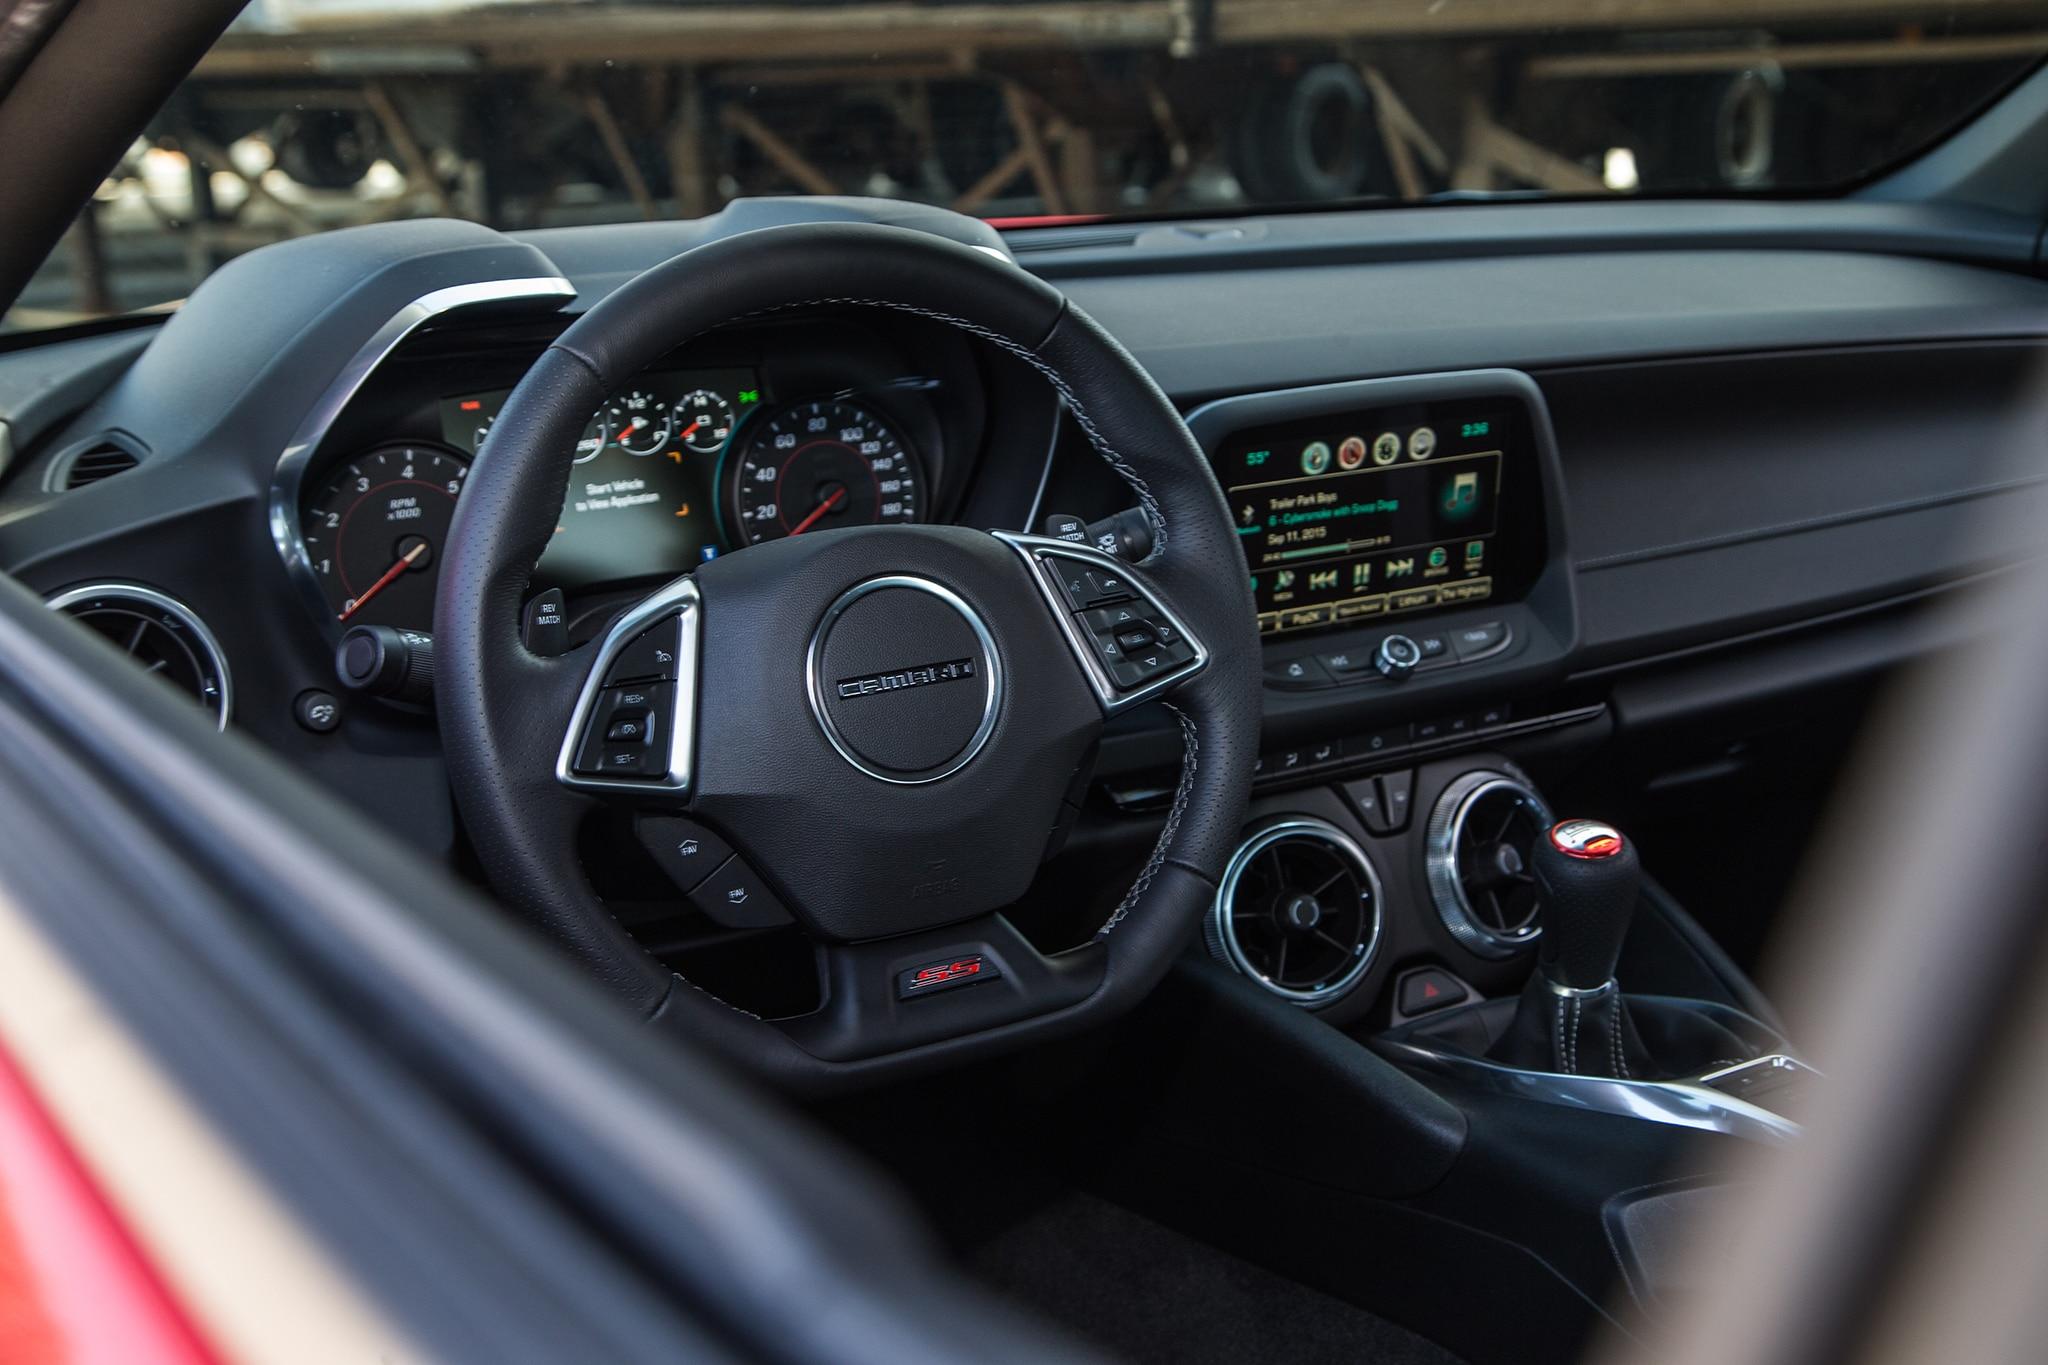 2016 Chevrolet Camaro 1SS Coupe Review: Killer Co-Pilot